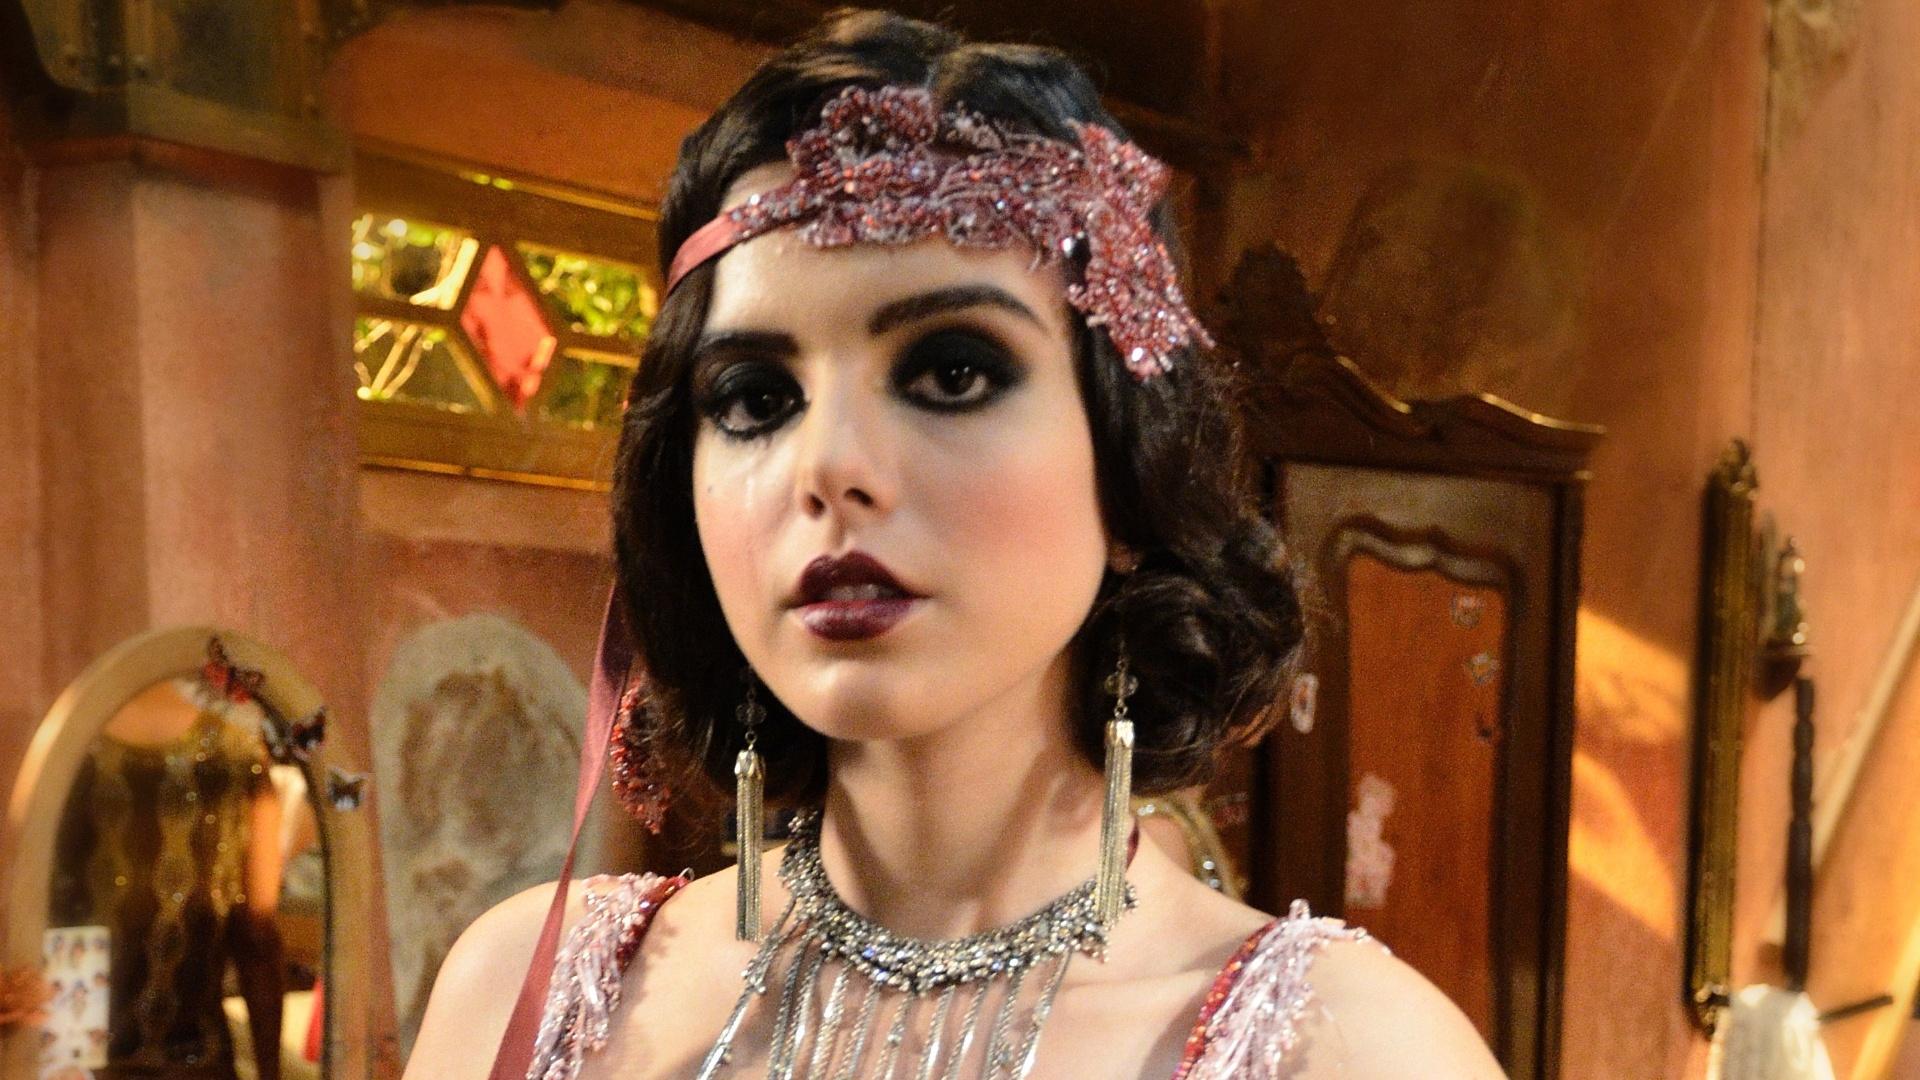 Lindinalva (Giovanna Lancellotti) vestida para trabalhar no Bataclã (17/7/12)